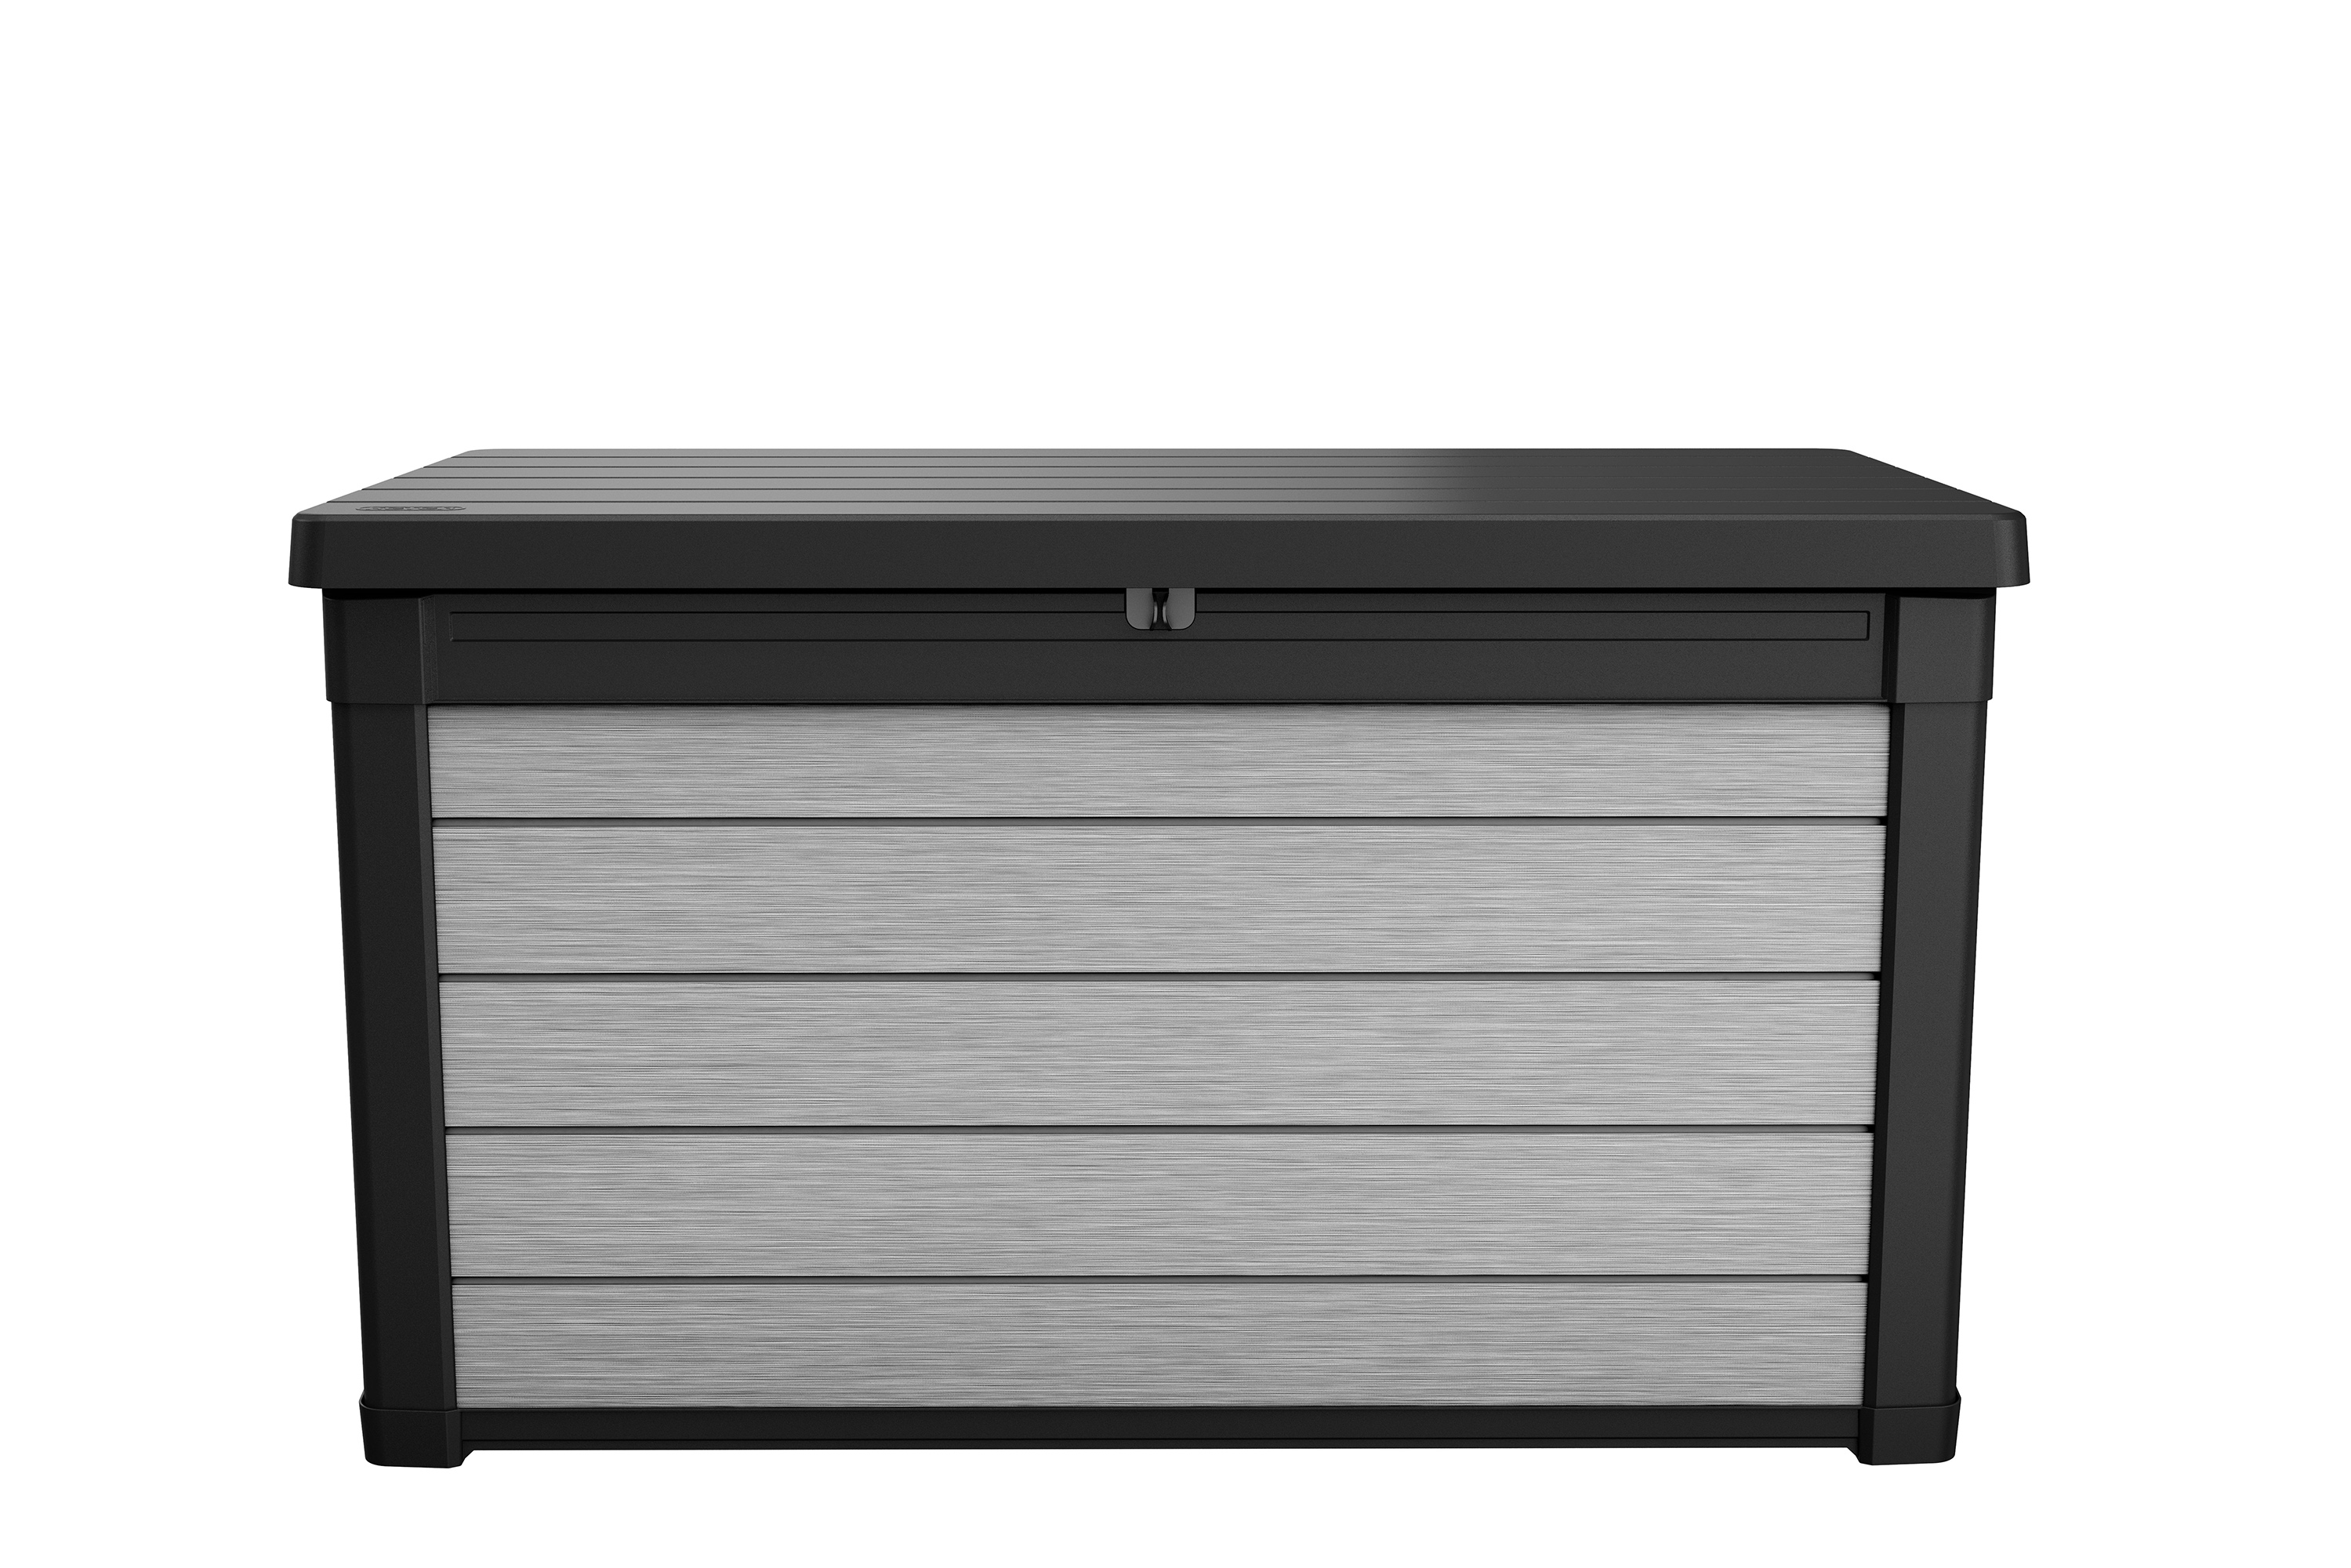 Keter Denali 100 Gallon Deck Box, Plastic Resin Outdoor Storage